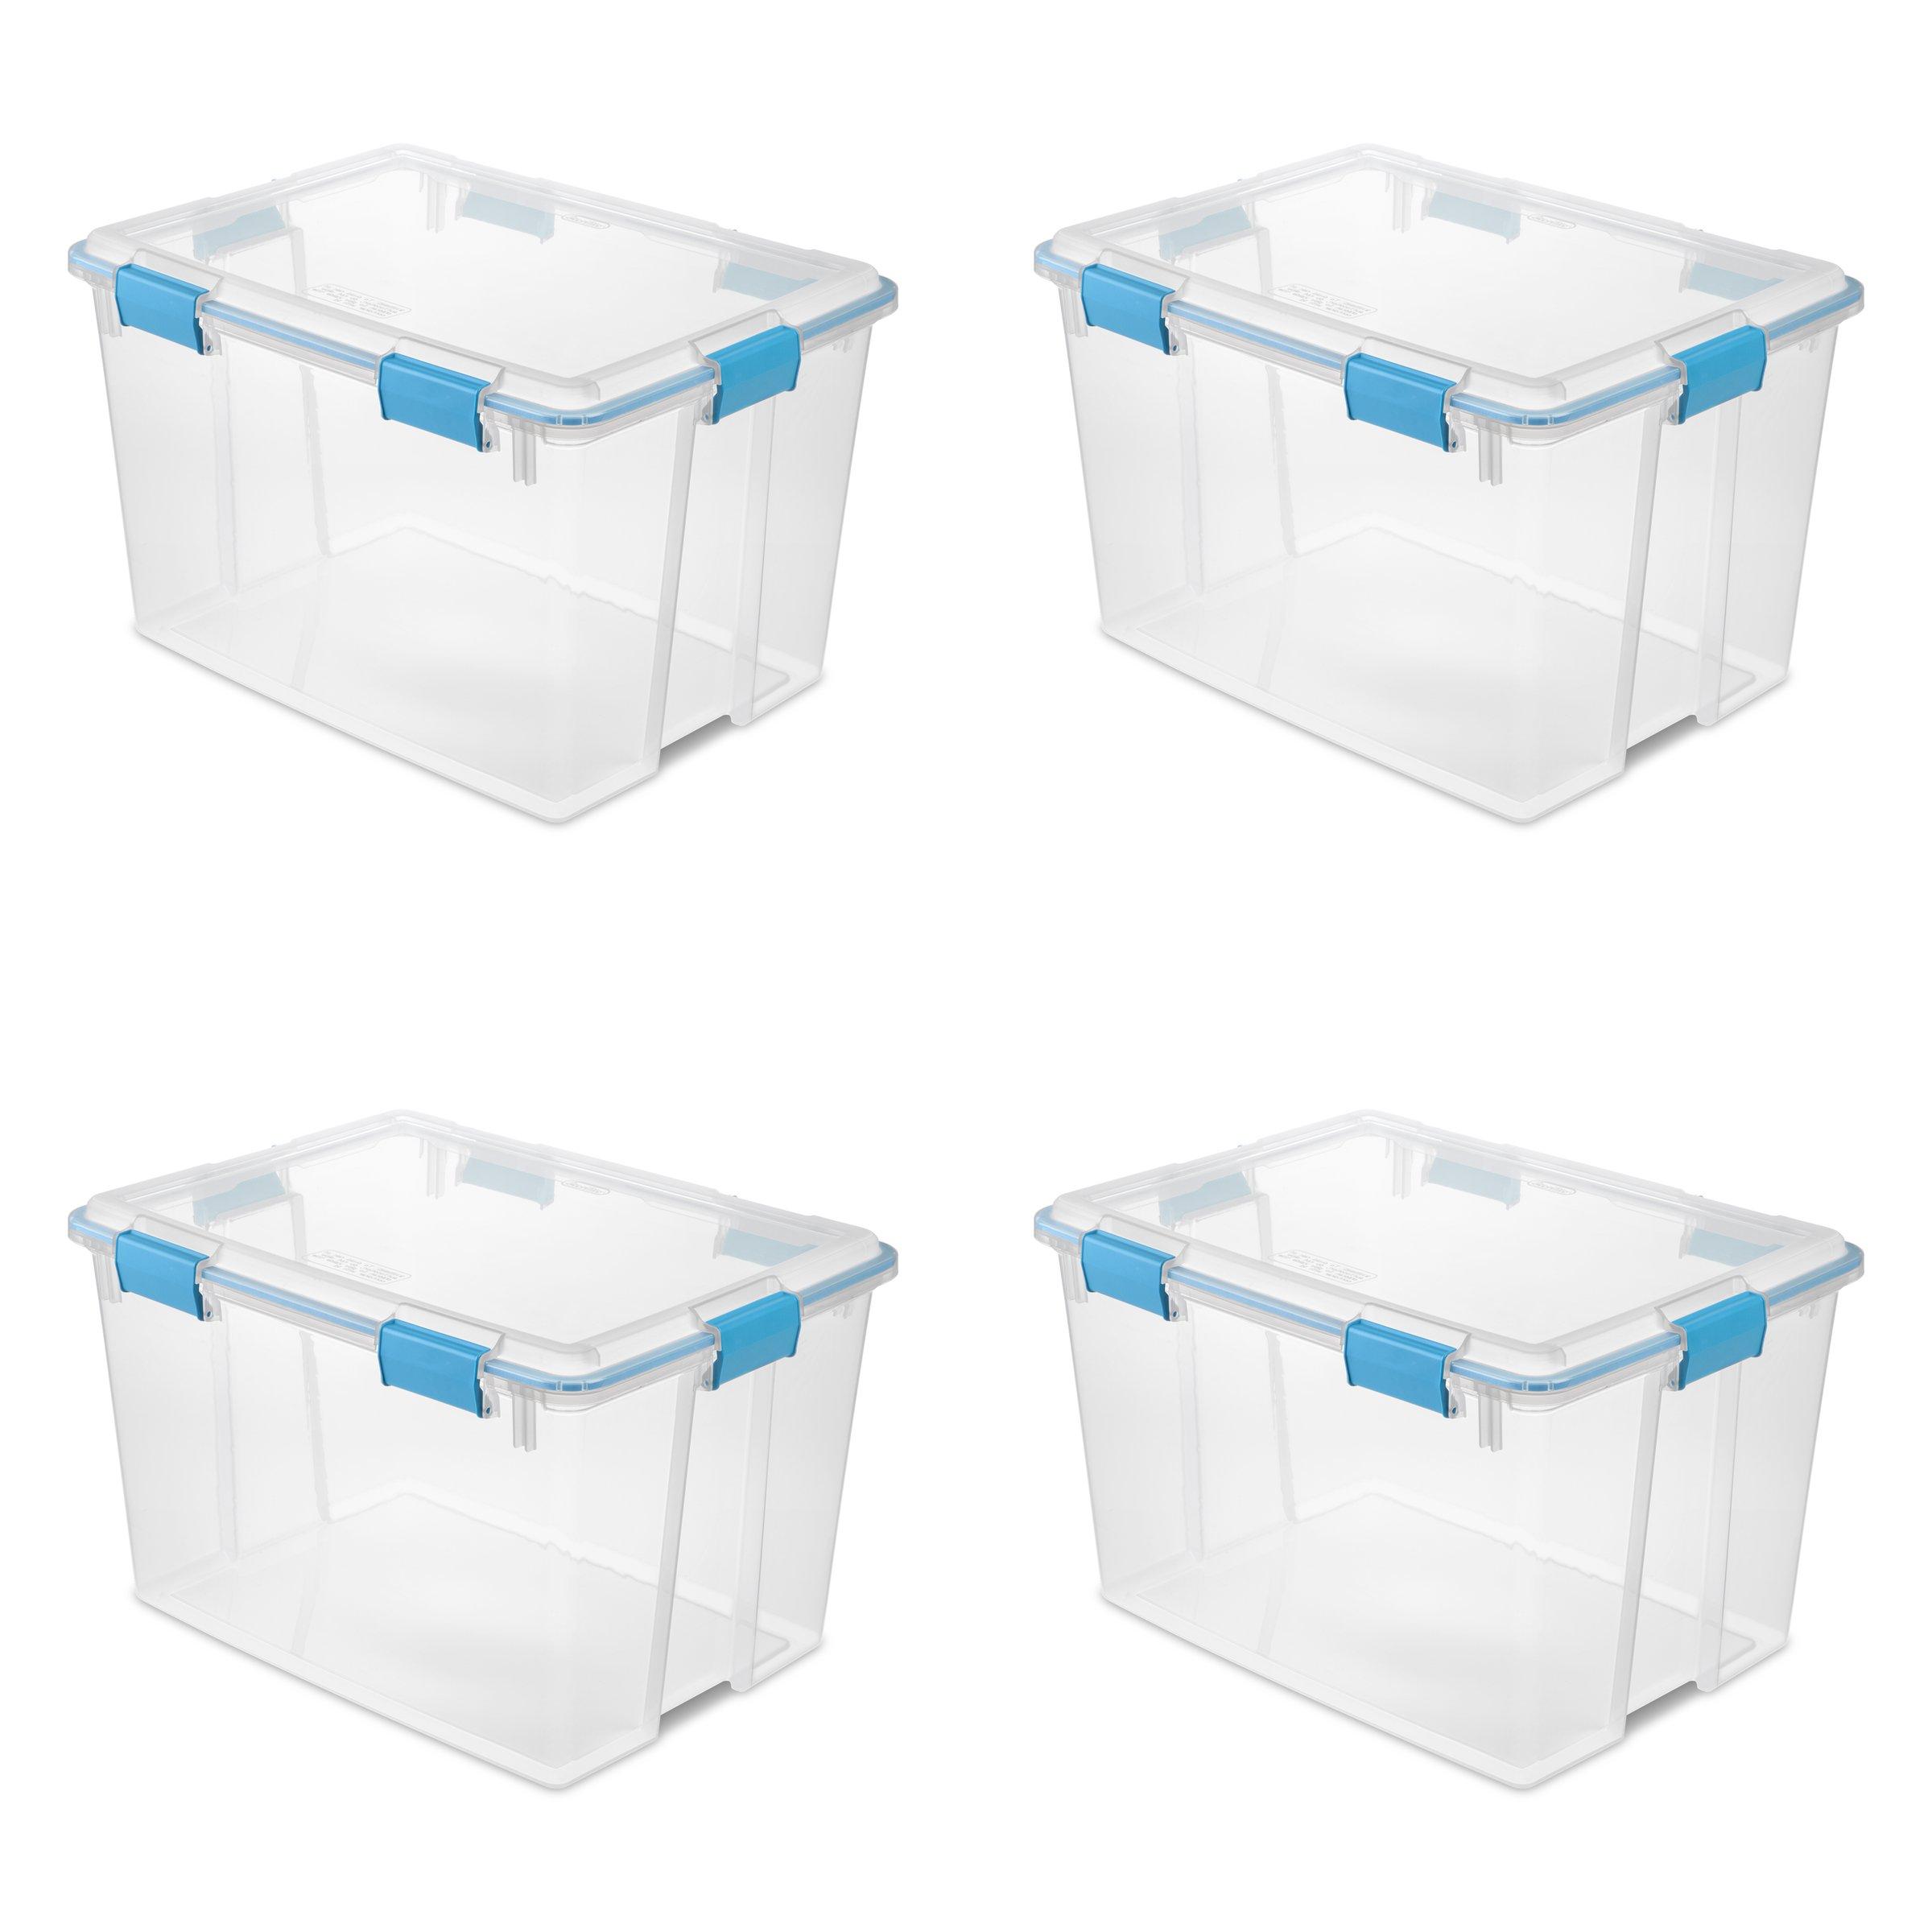 STERILITE 19384304 80 Quart/76 Liter Gasket Box, Clear Lid & Base w/Blue Aquarium Latches & Gasket, 4-Pack